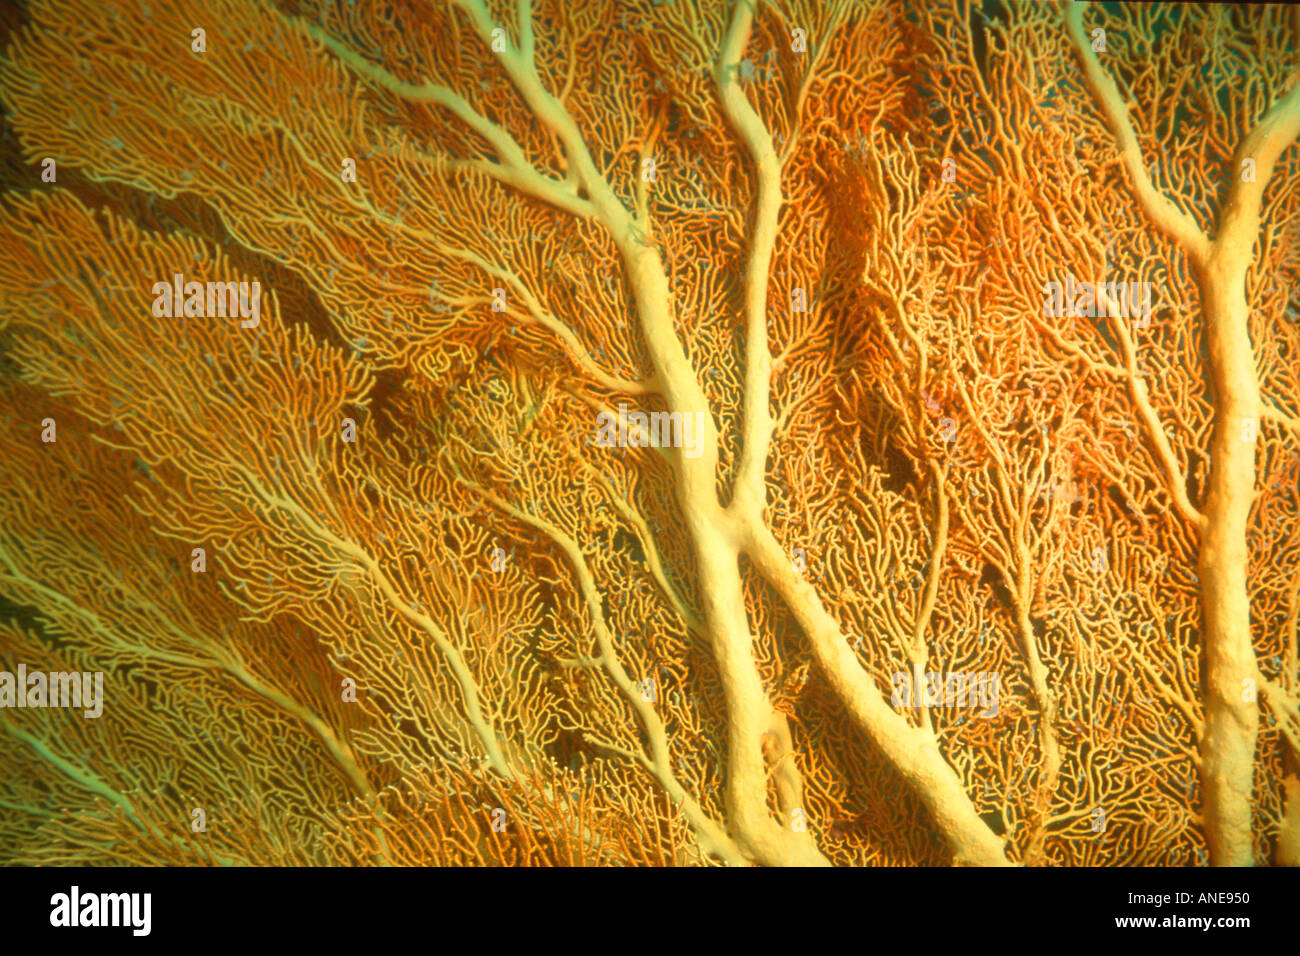 Ventilateur gorgones Subergorgia mollis ou Annella mollis Mili Pacifique Nord Îles Marshall Photo Stock